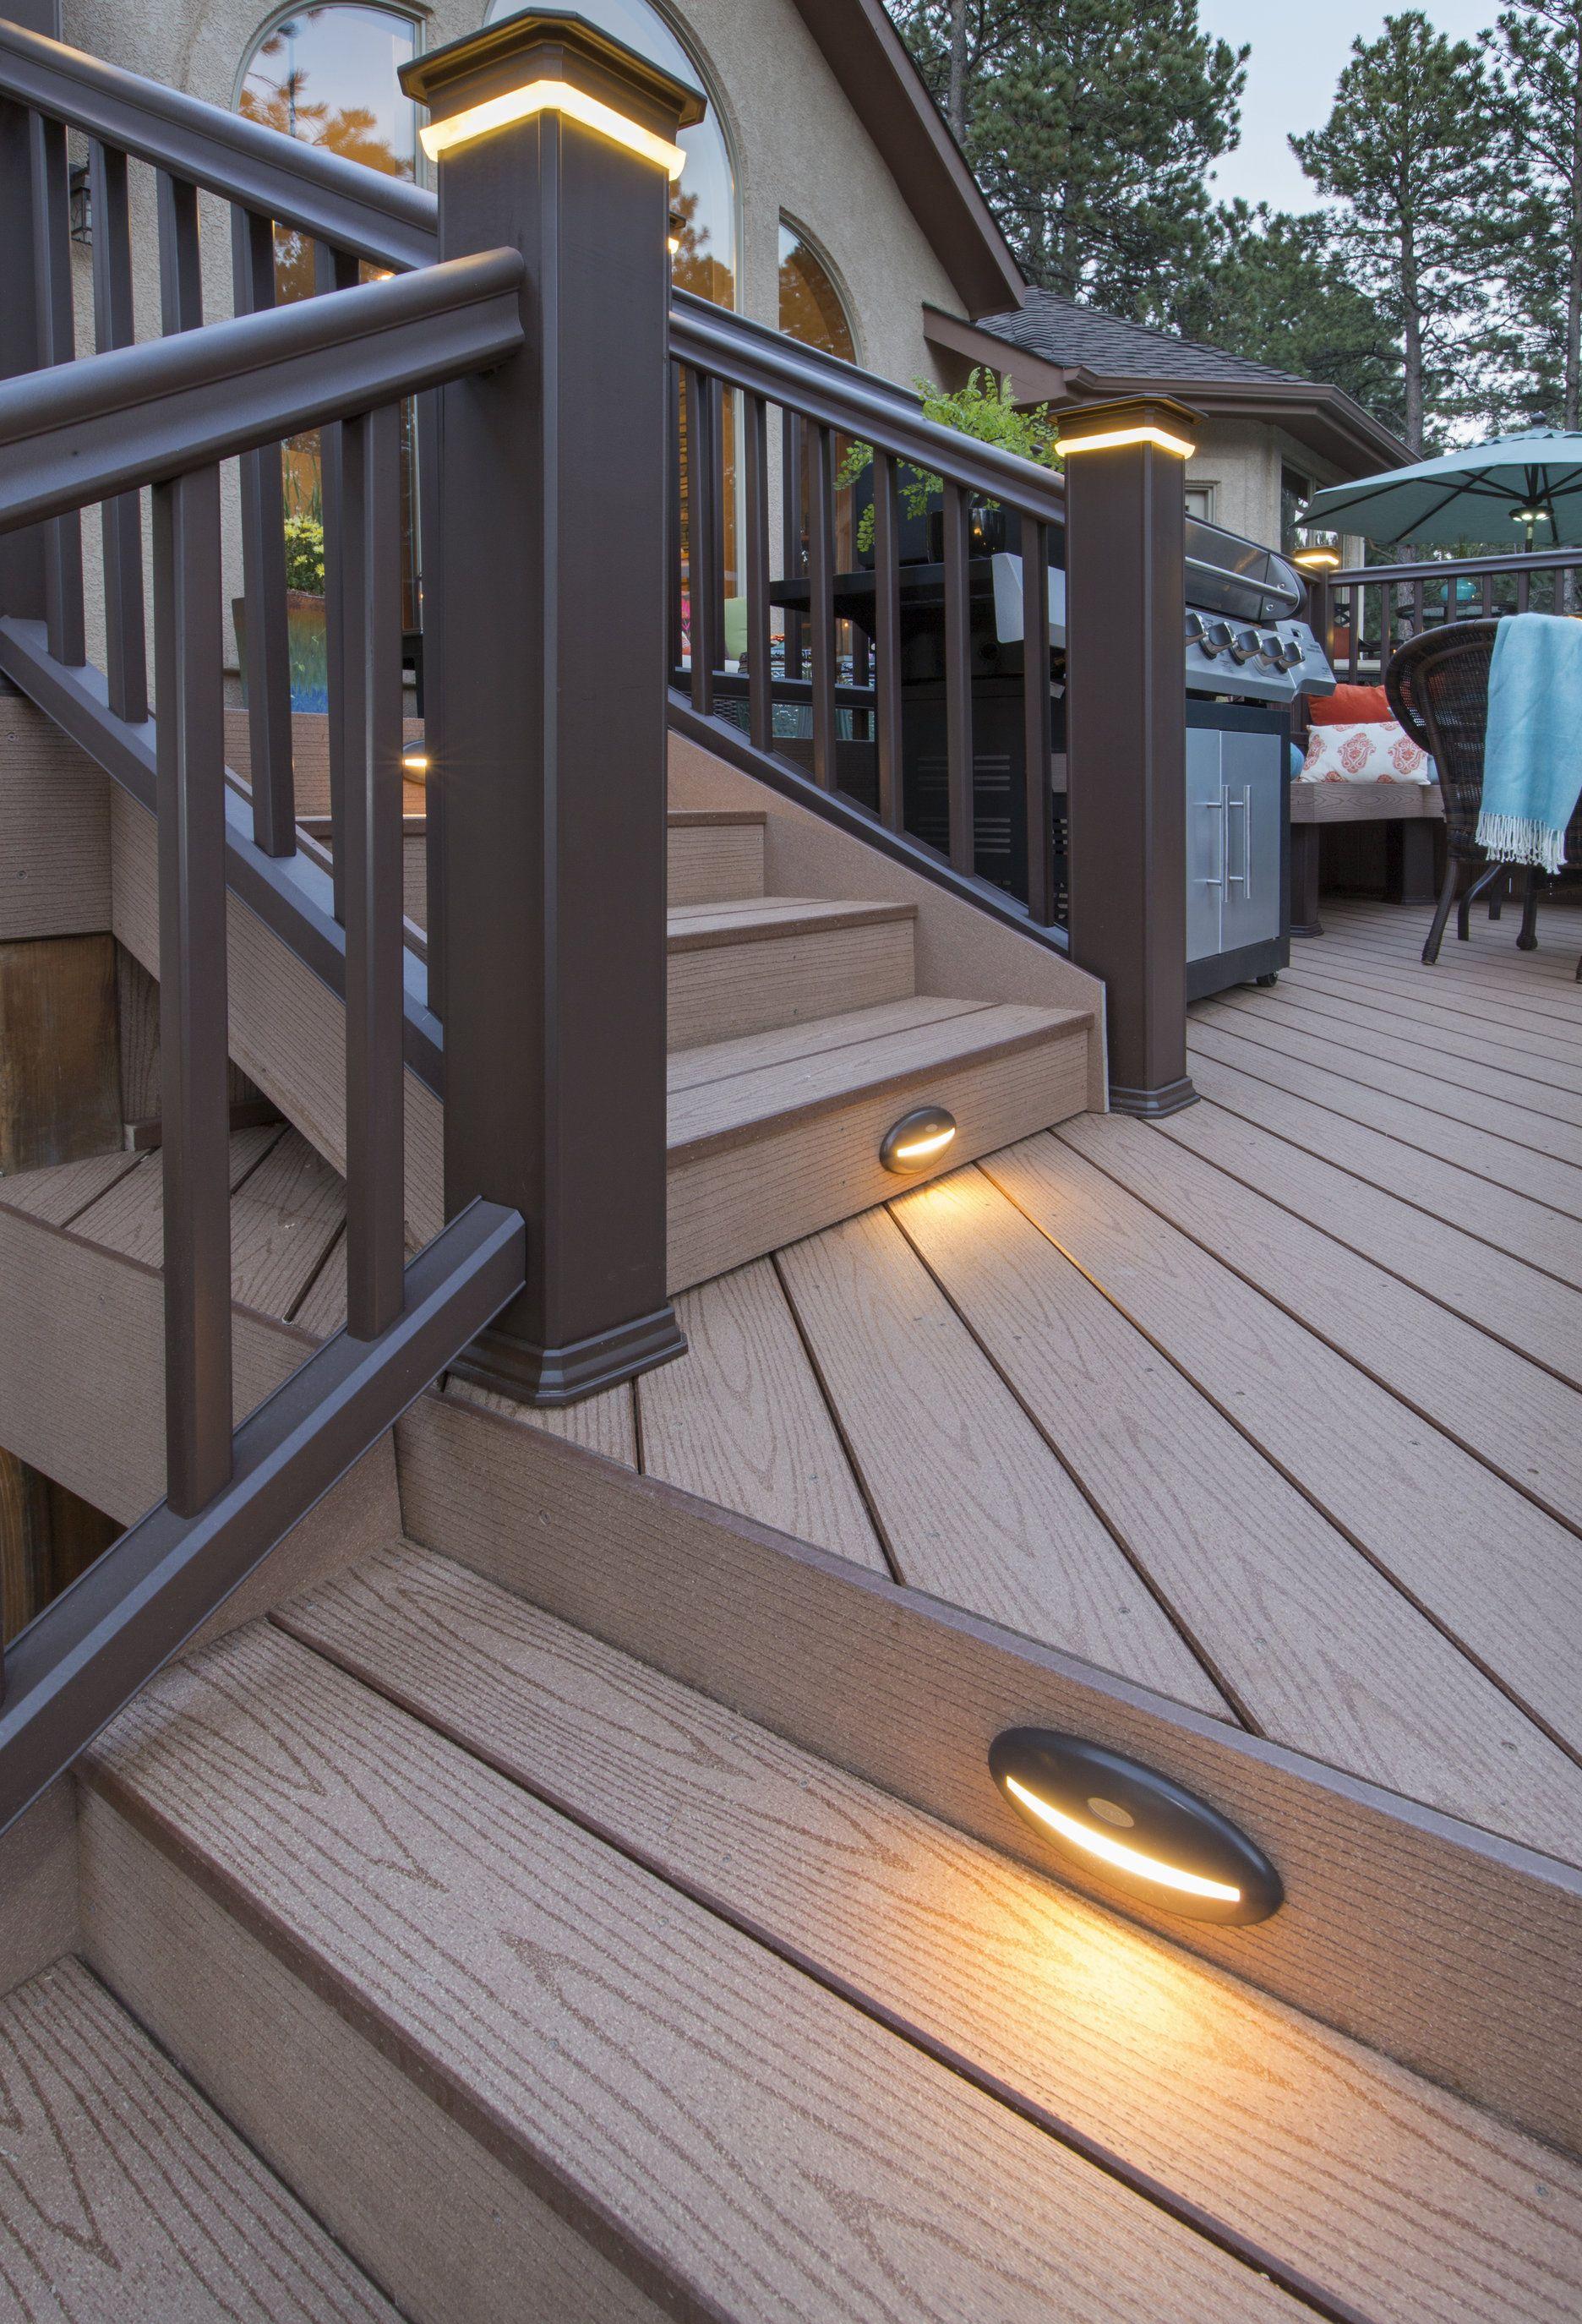 Lighting Products For Decks Porches Railings Timbertech Patio Deck Designs Building A Deck Deck Lighting